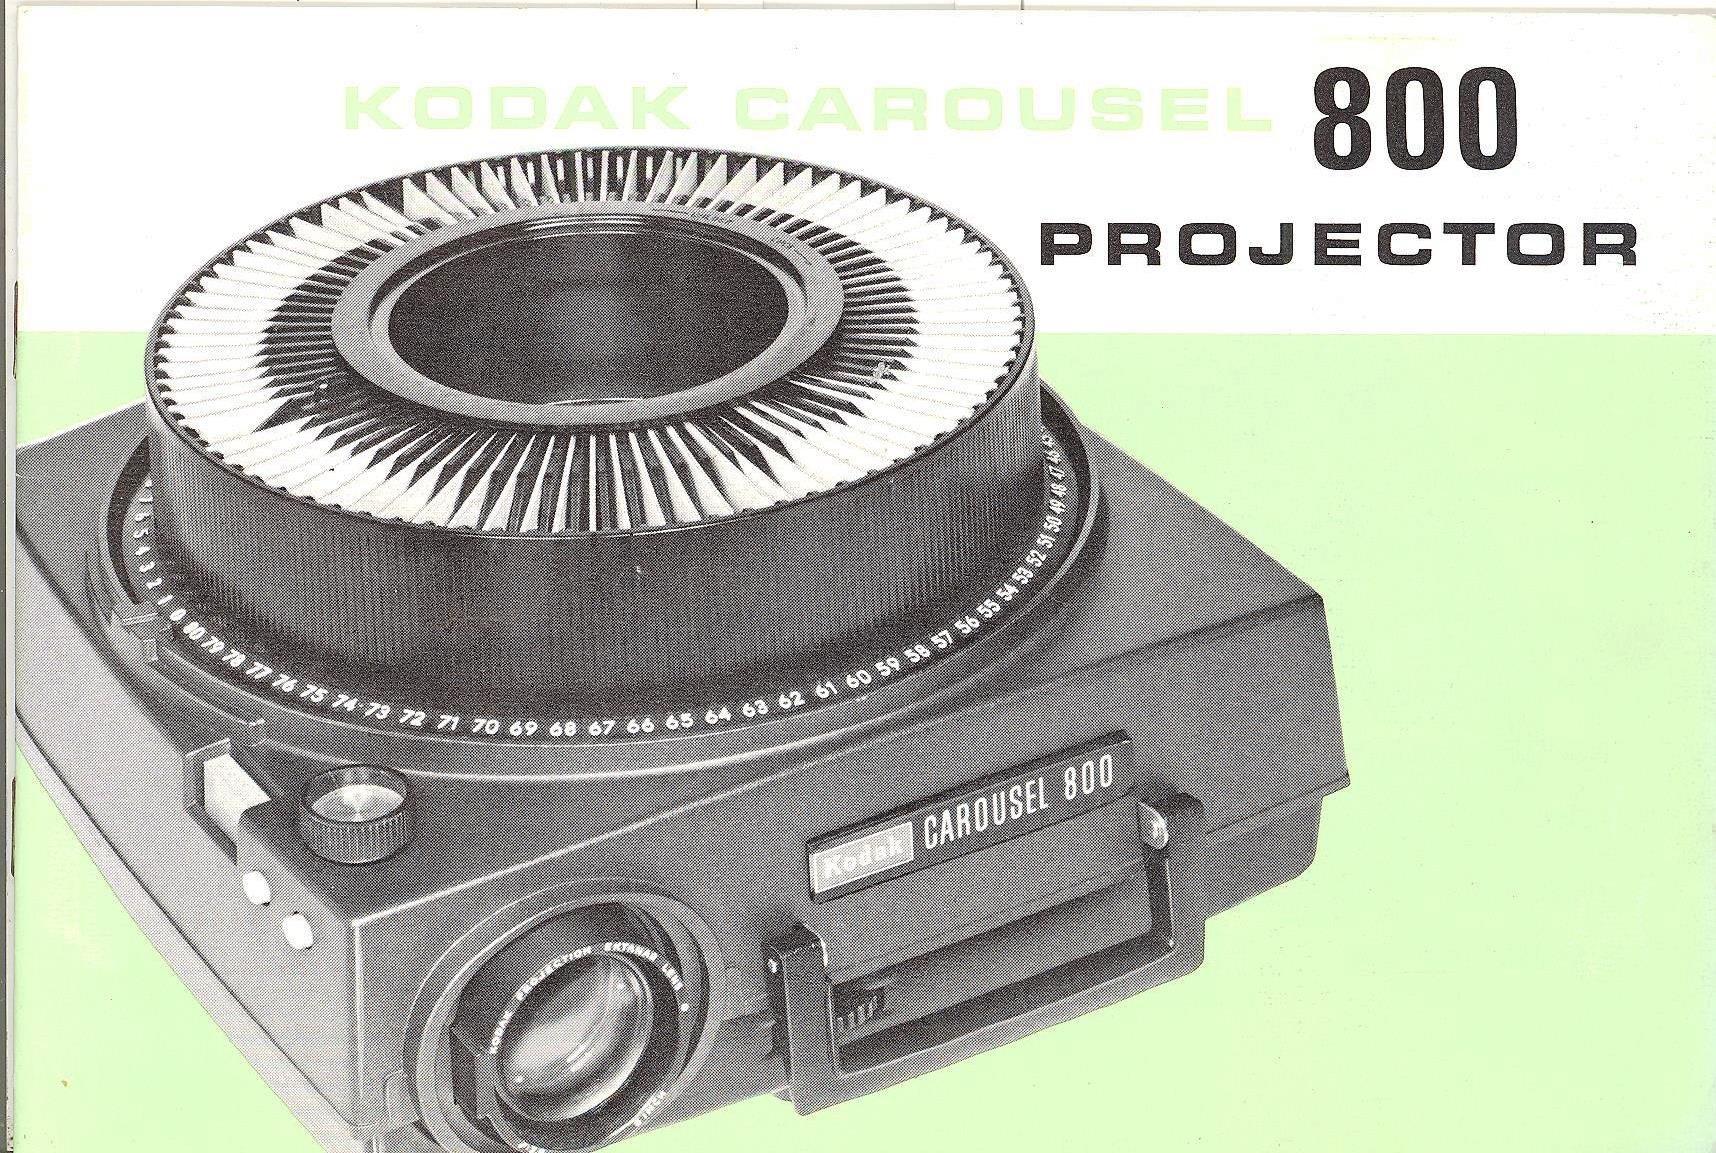 kodak carousel 800 slide projector original instruction manual rh amazon com KC-10 Training Kodak Carousel Kodak Carousel Slide Projector